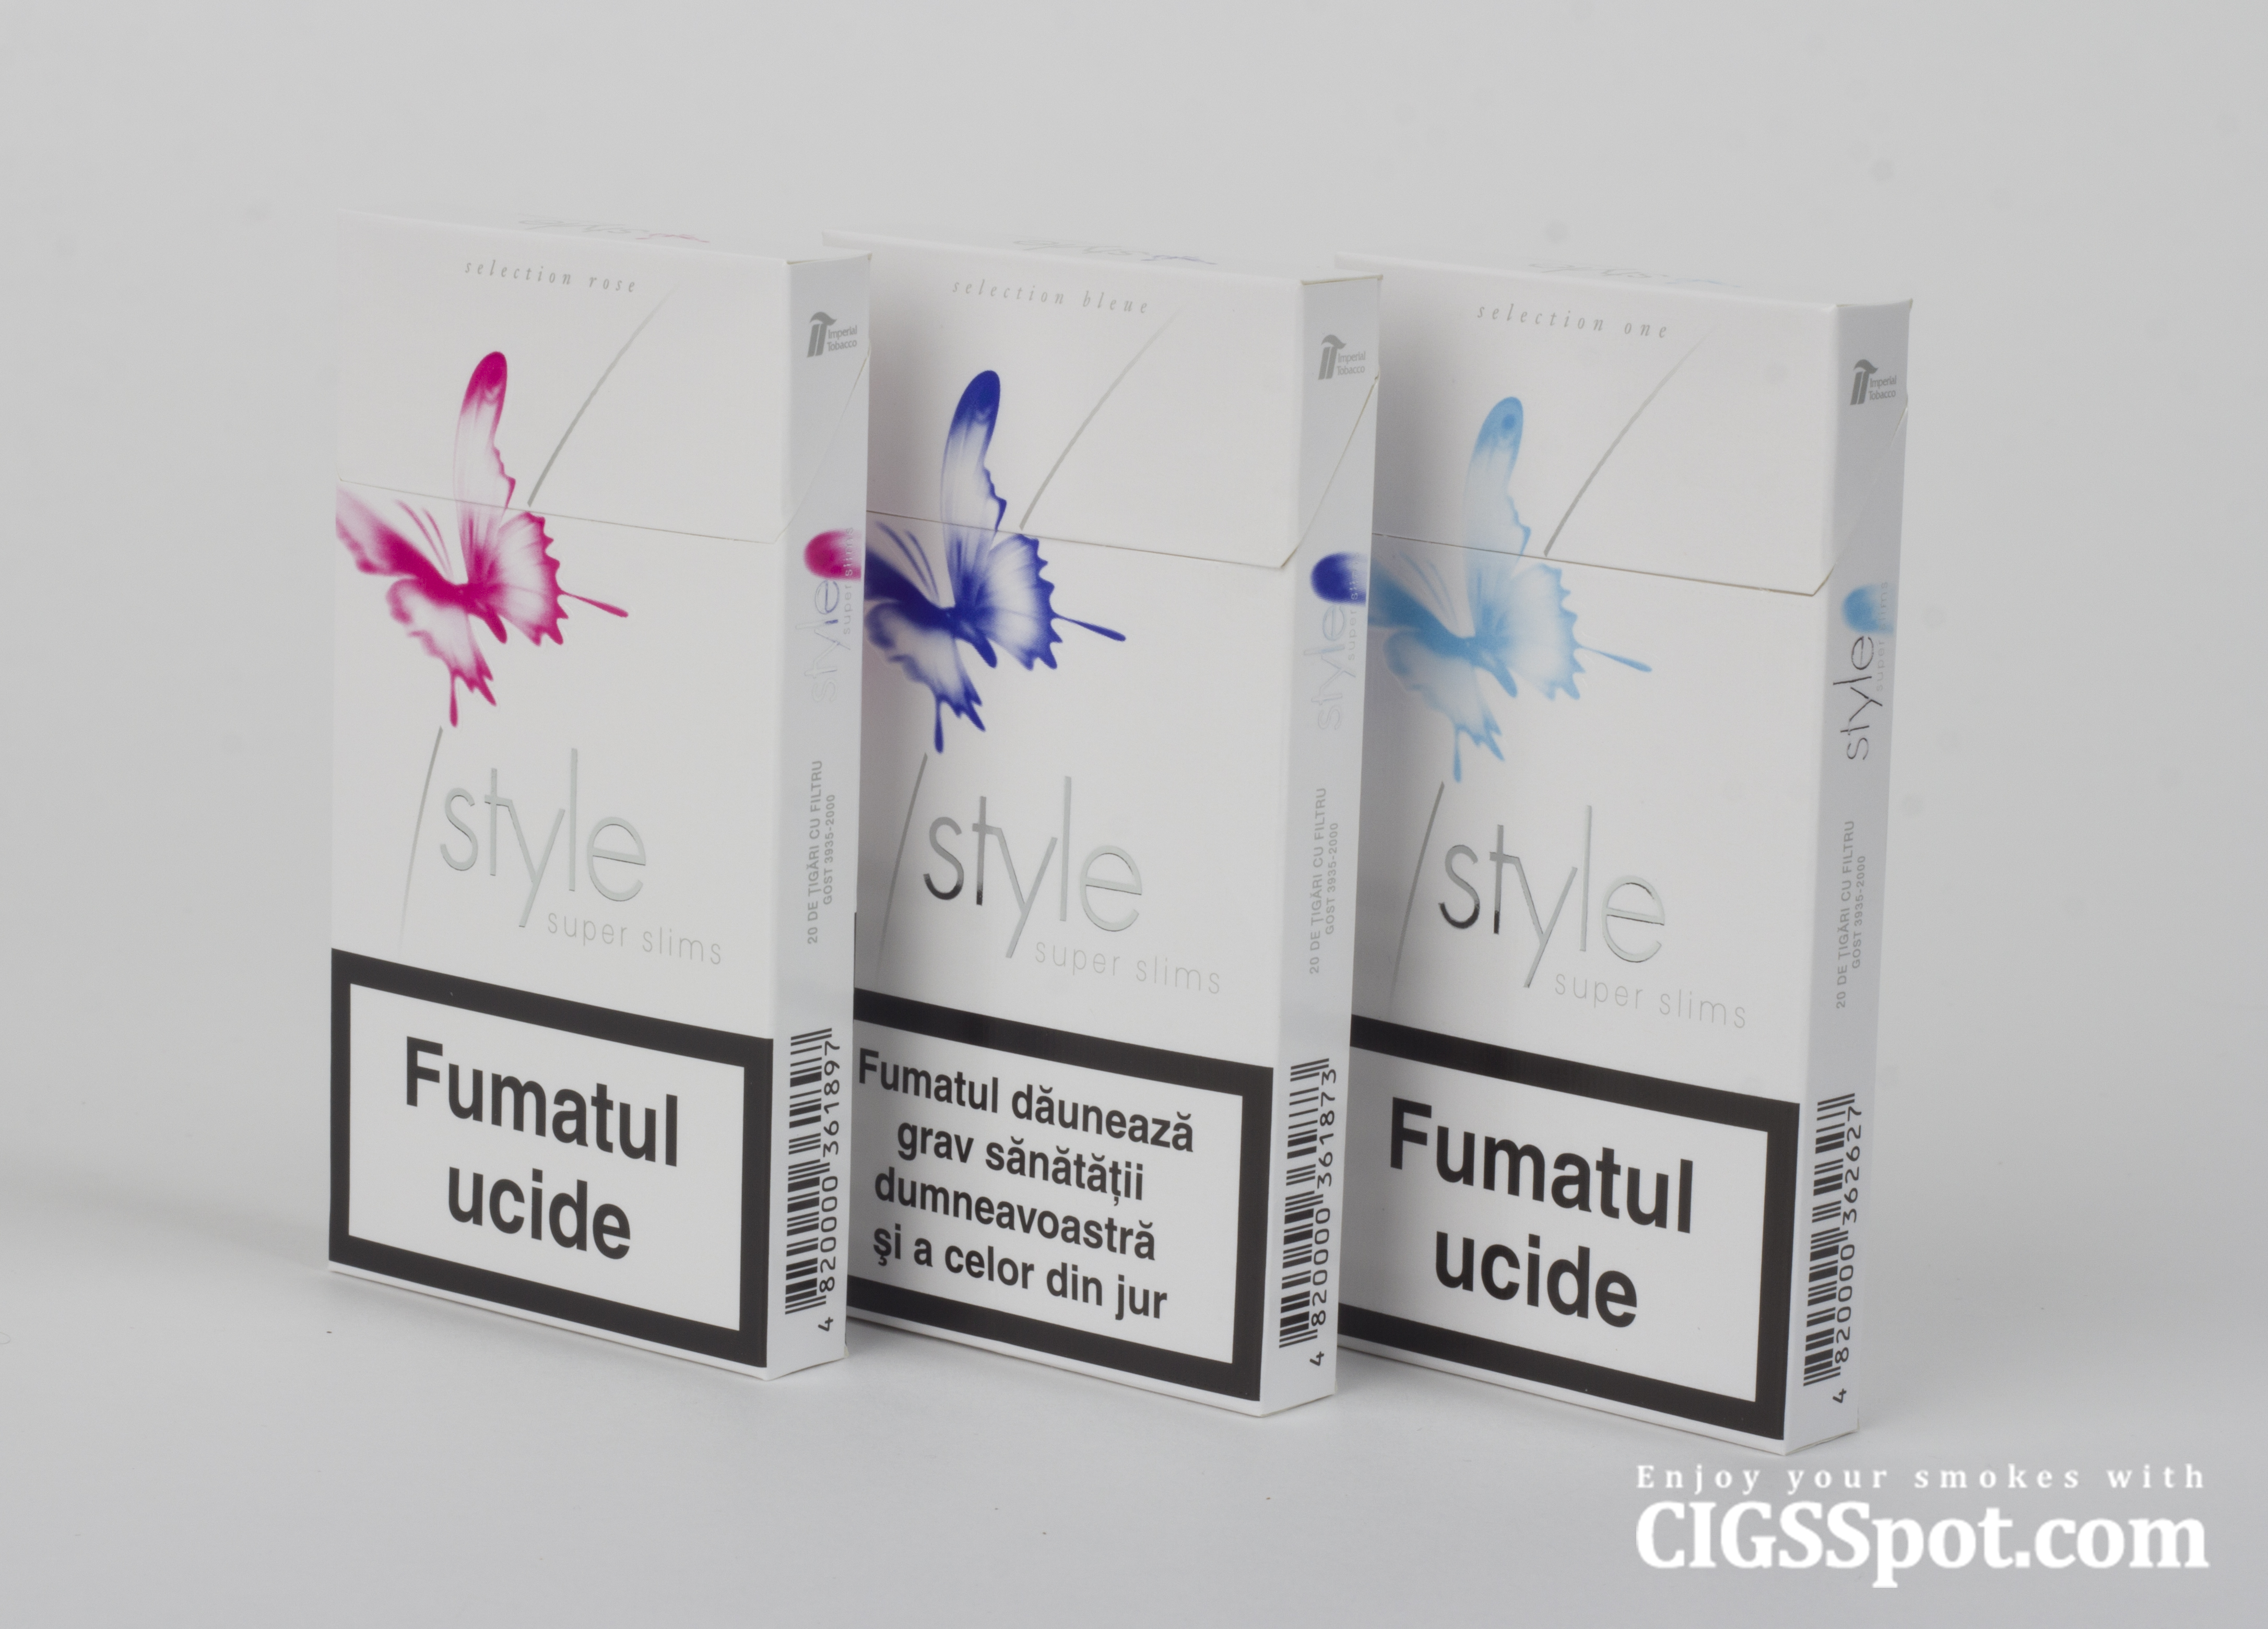 Style Cigarettes